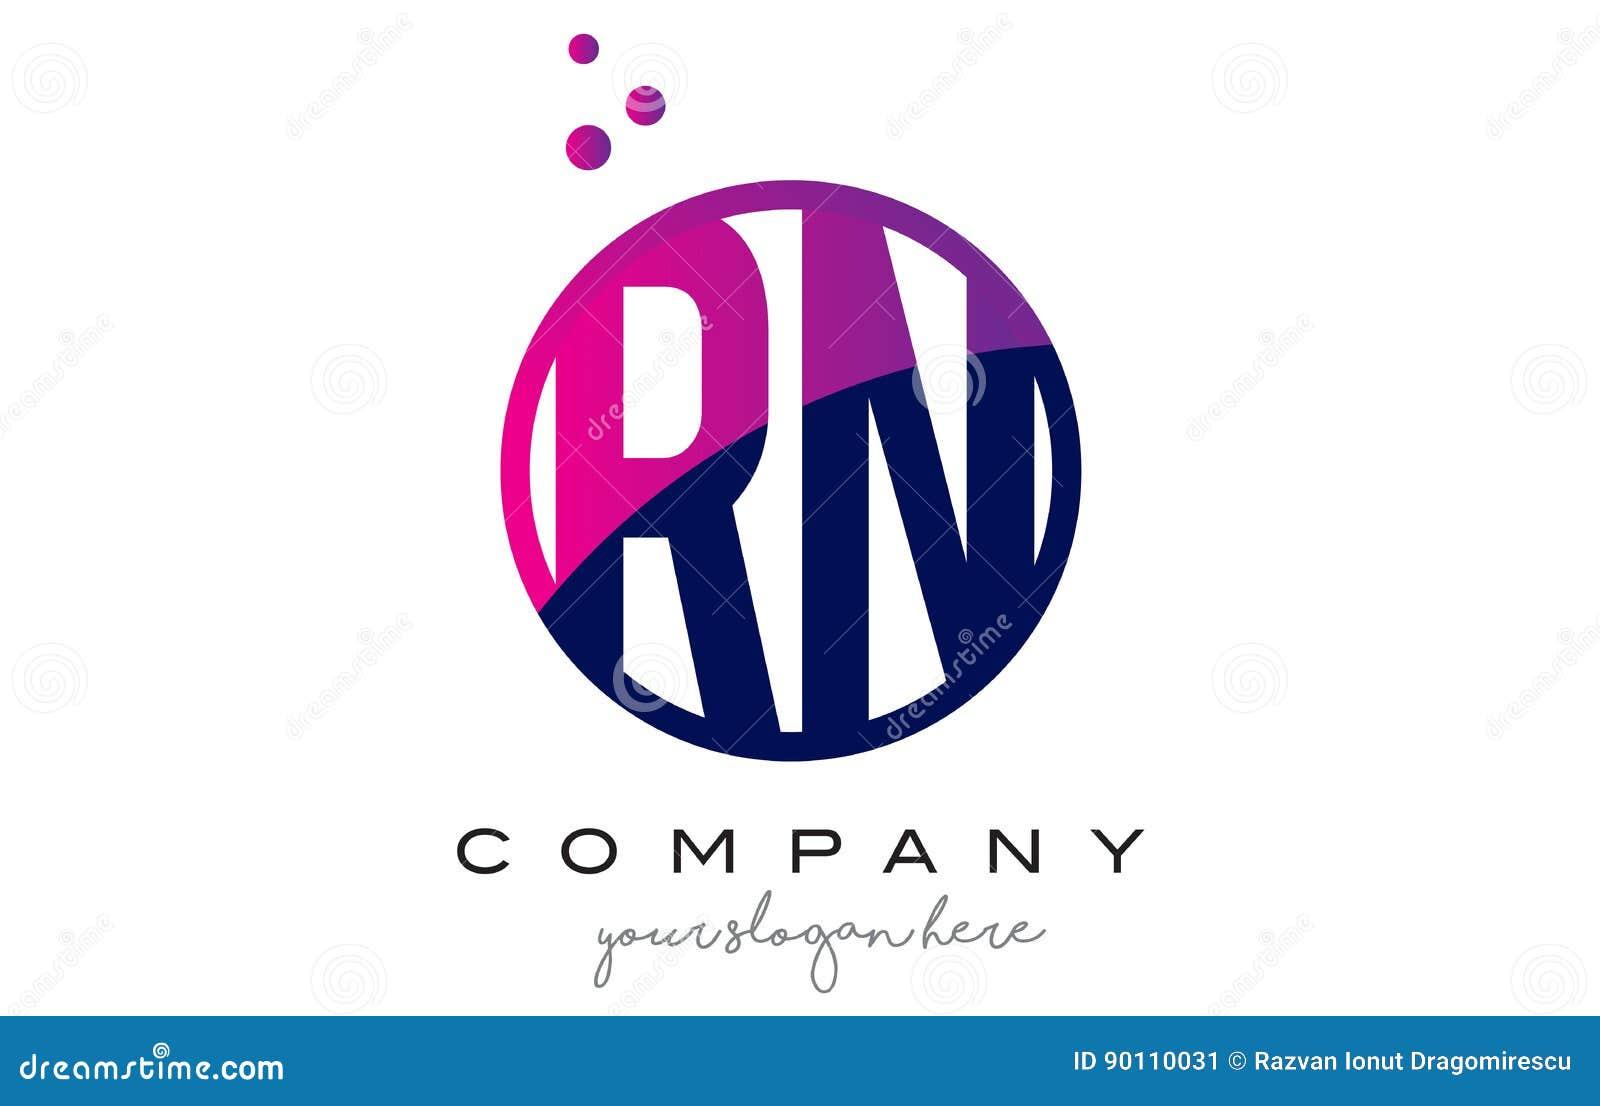 Rn r n circle letter logo design with purple dots bubbles stock download rn r n circle letter logo design with purple dots bubbles stock vector illustration of altavistaventures Images